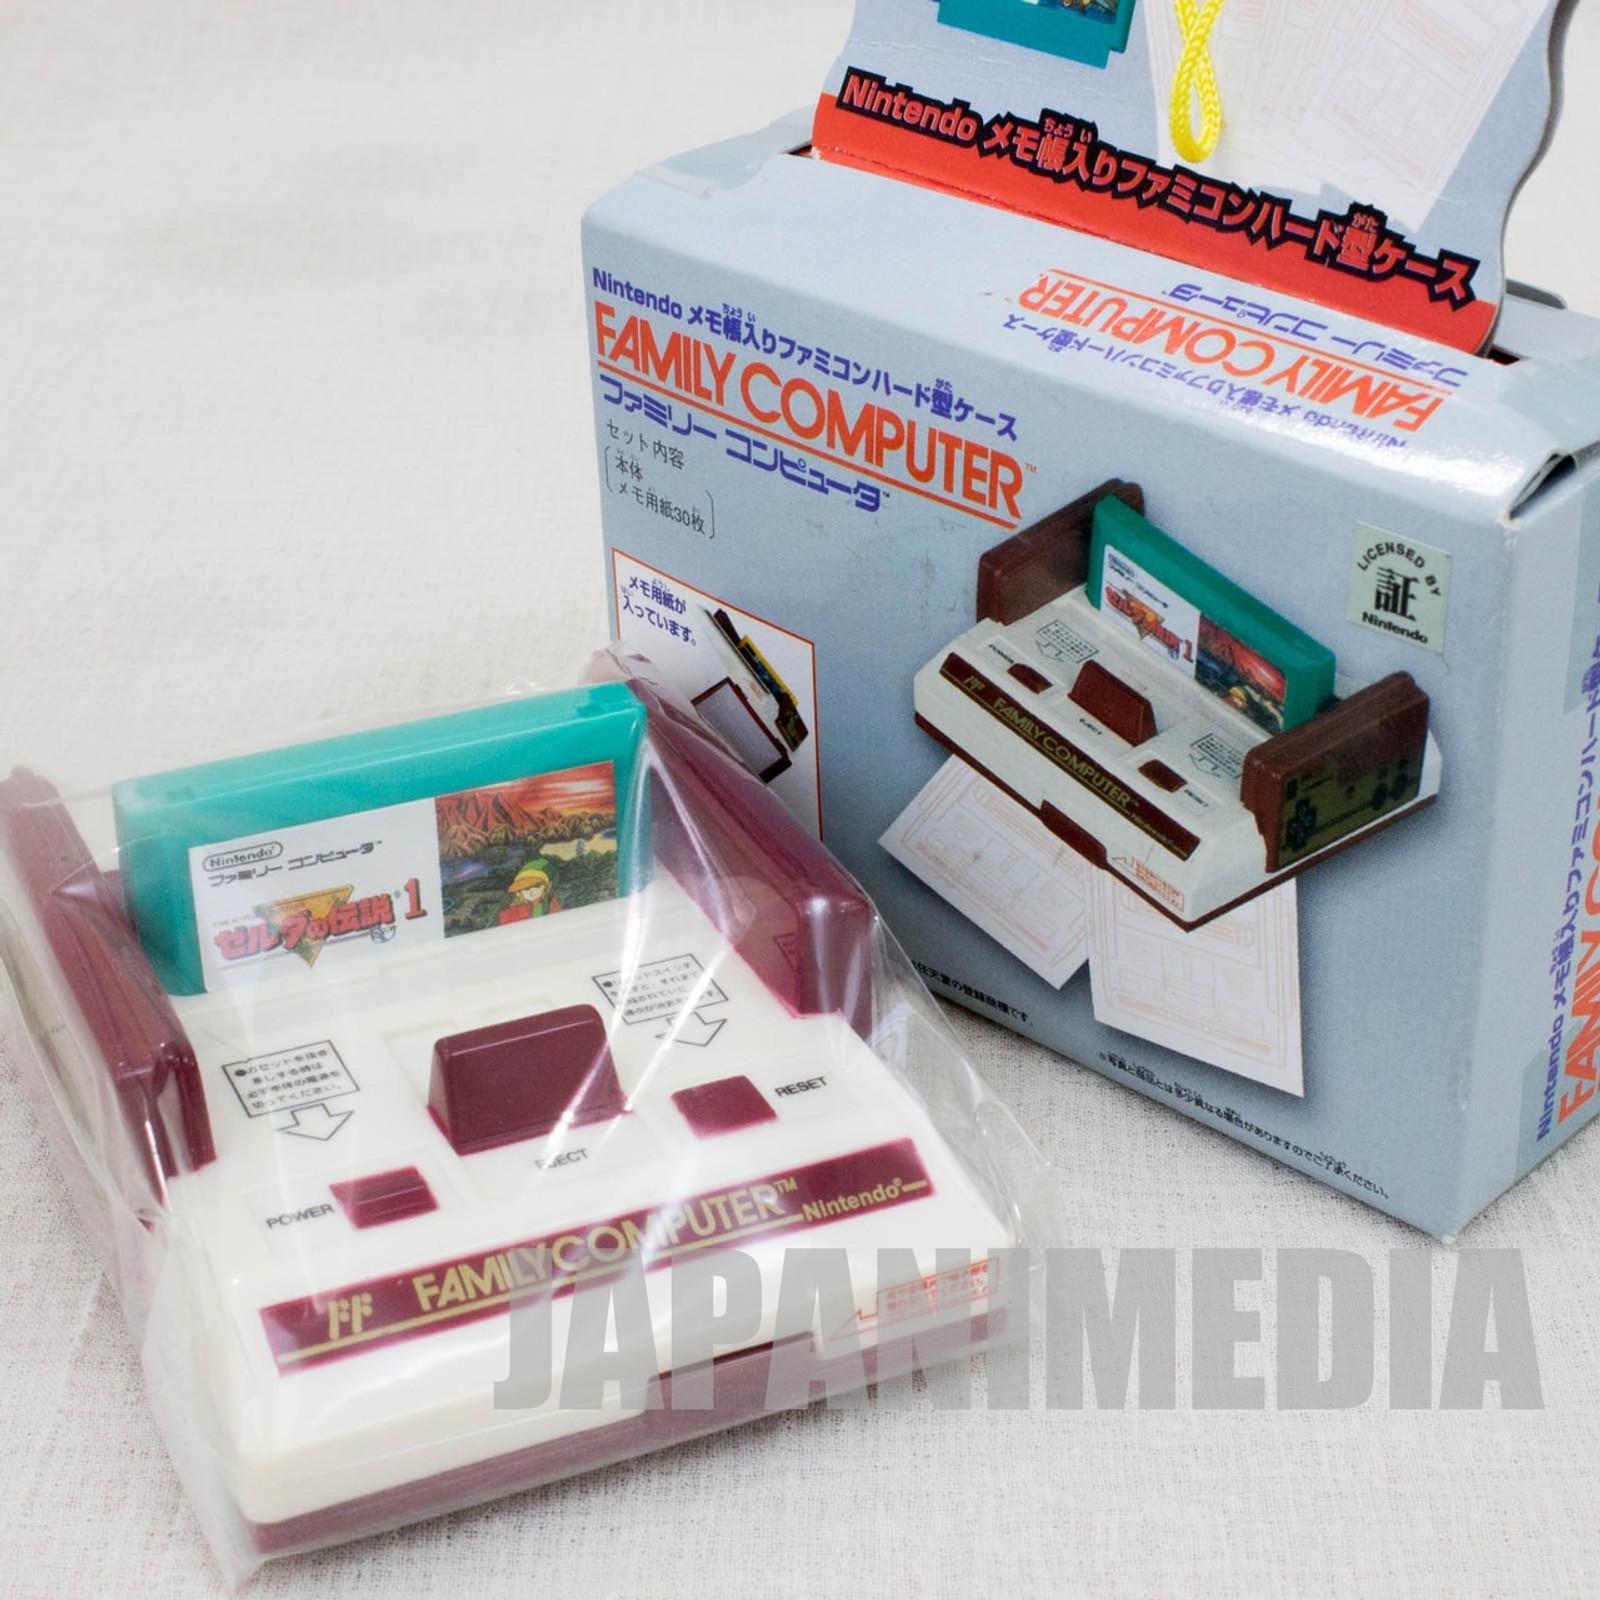 Legend of Zelda Nintendo NES Famicom Family Computer Type Memo Paper Case JAPAN